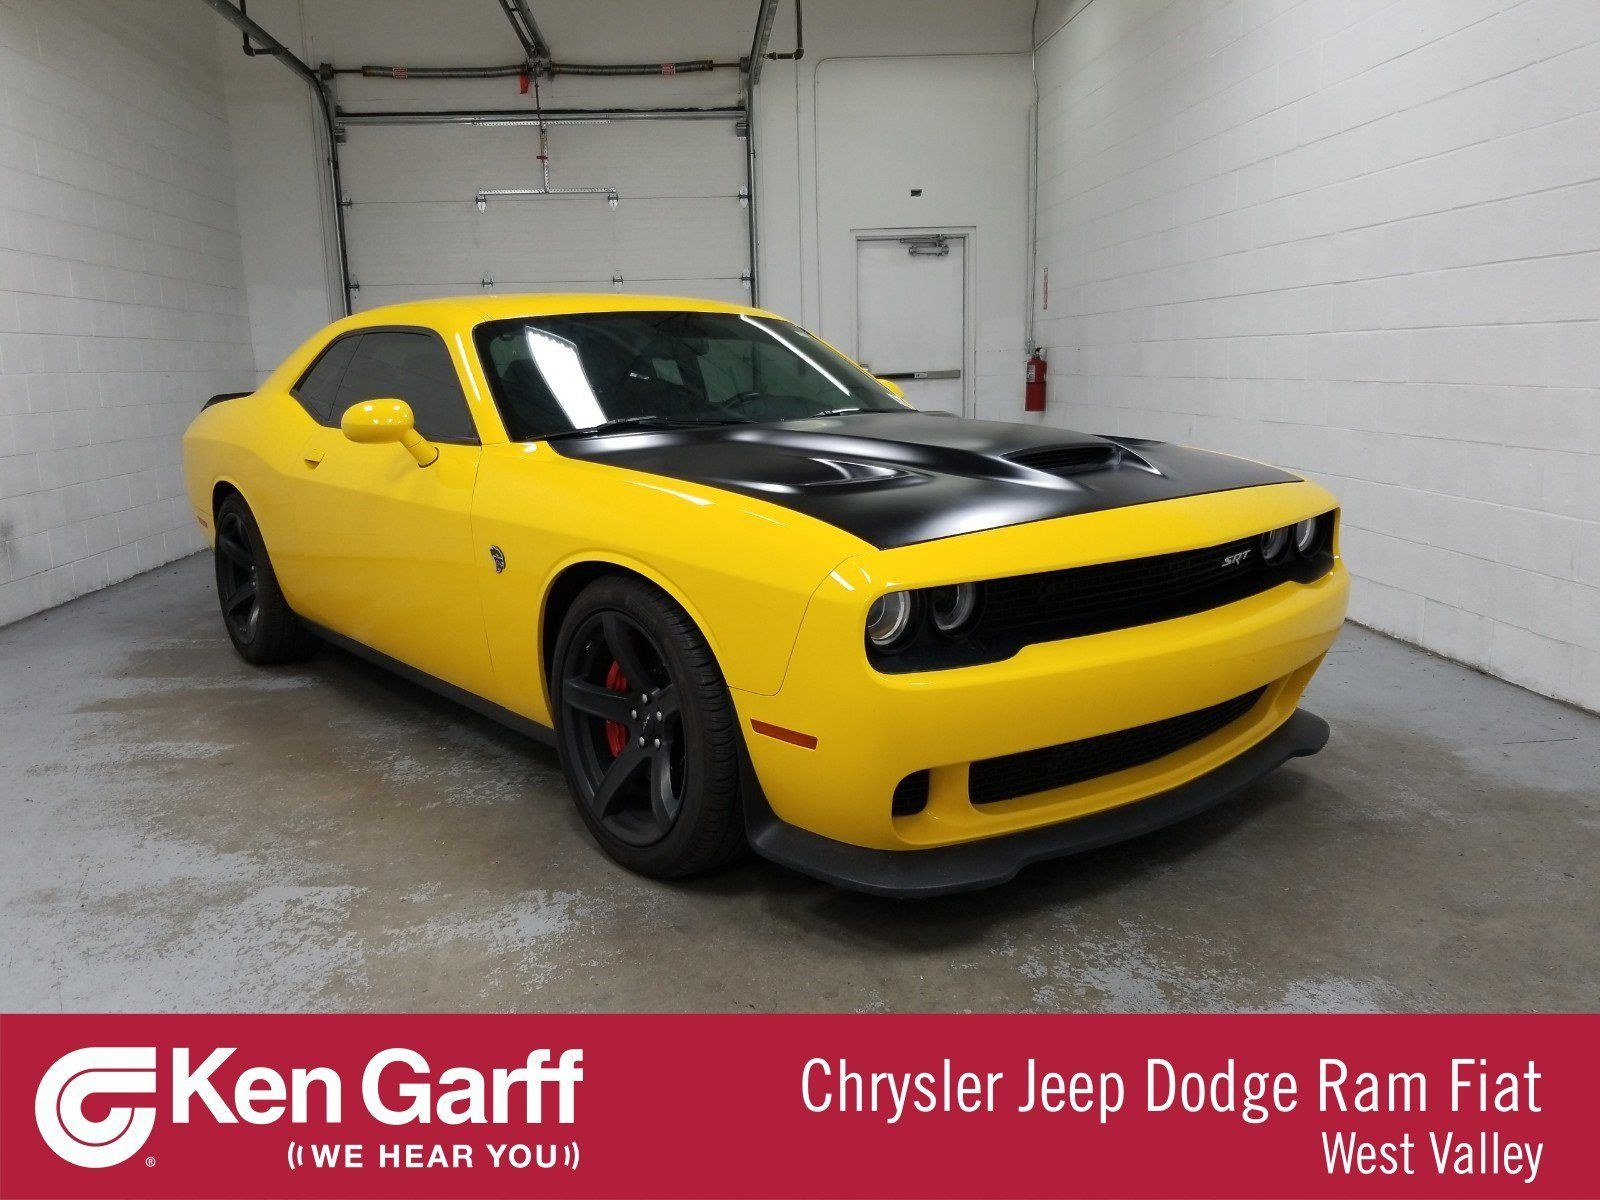 2021 Challenger Srt8 Hellcat Pricing Challenger Srt Hellcat Dodge Challenger Srt Hellcat Dodge Challenger Srt